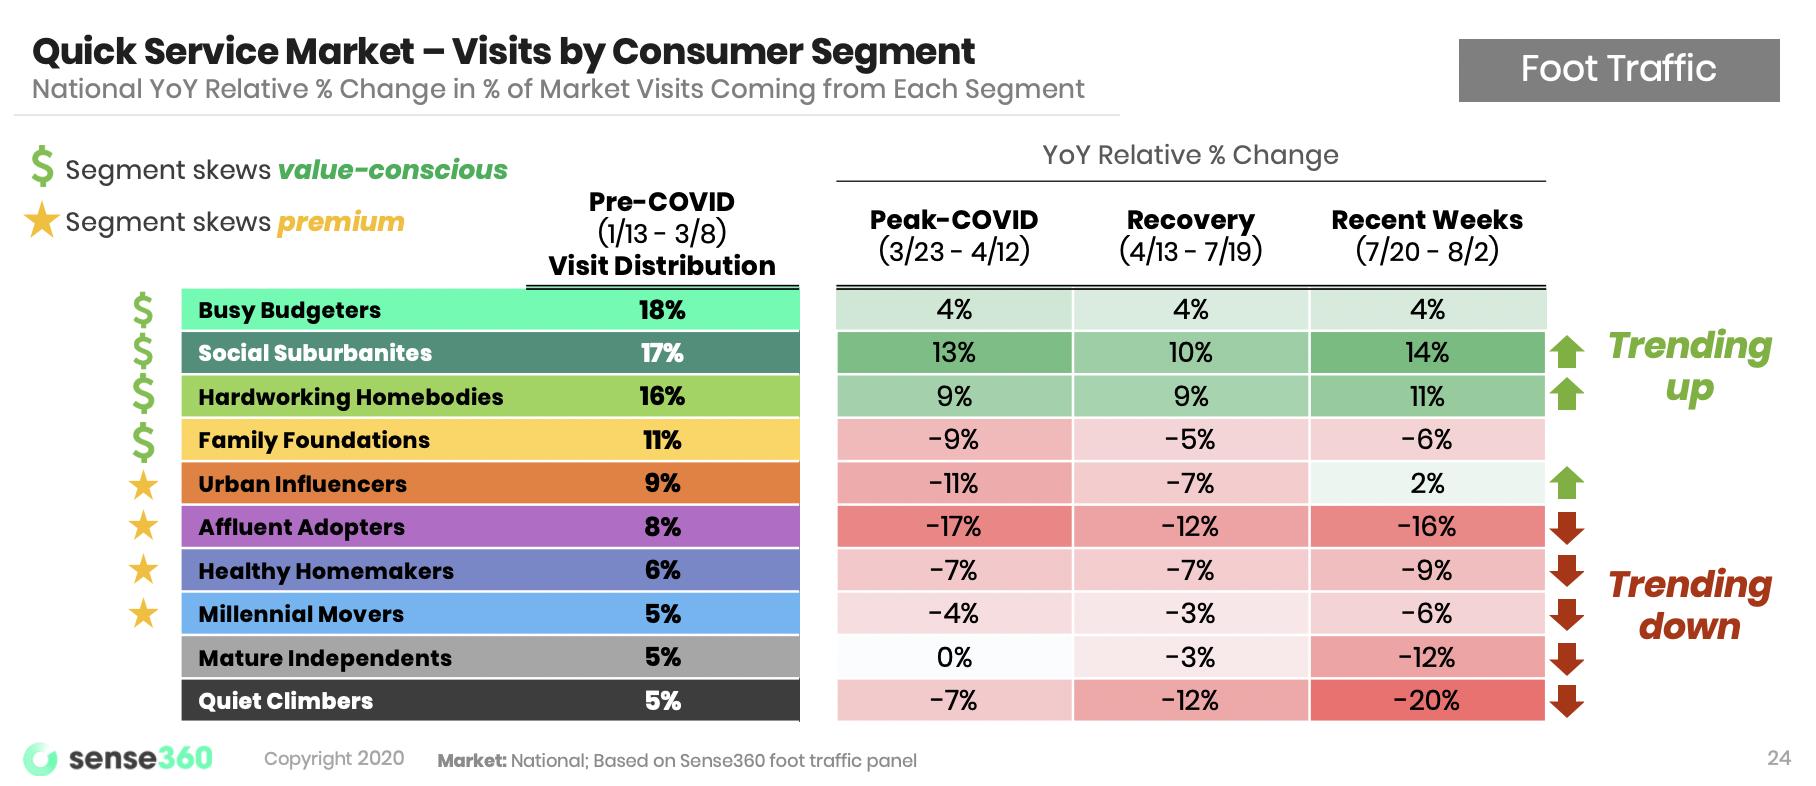 qsr-visits-by-segment